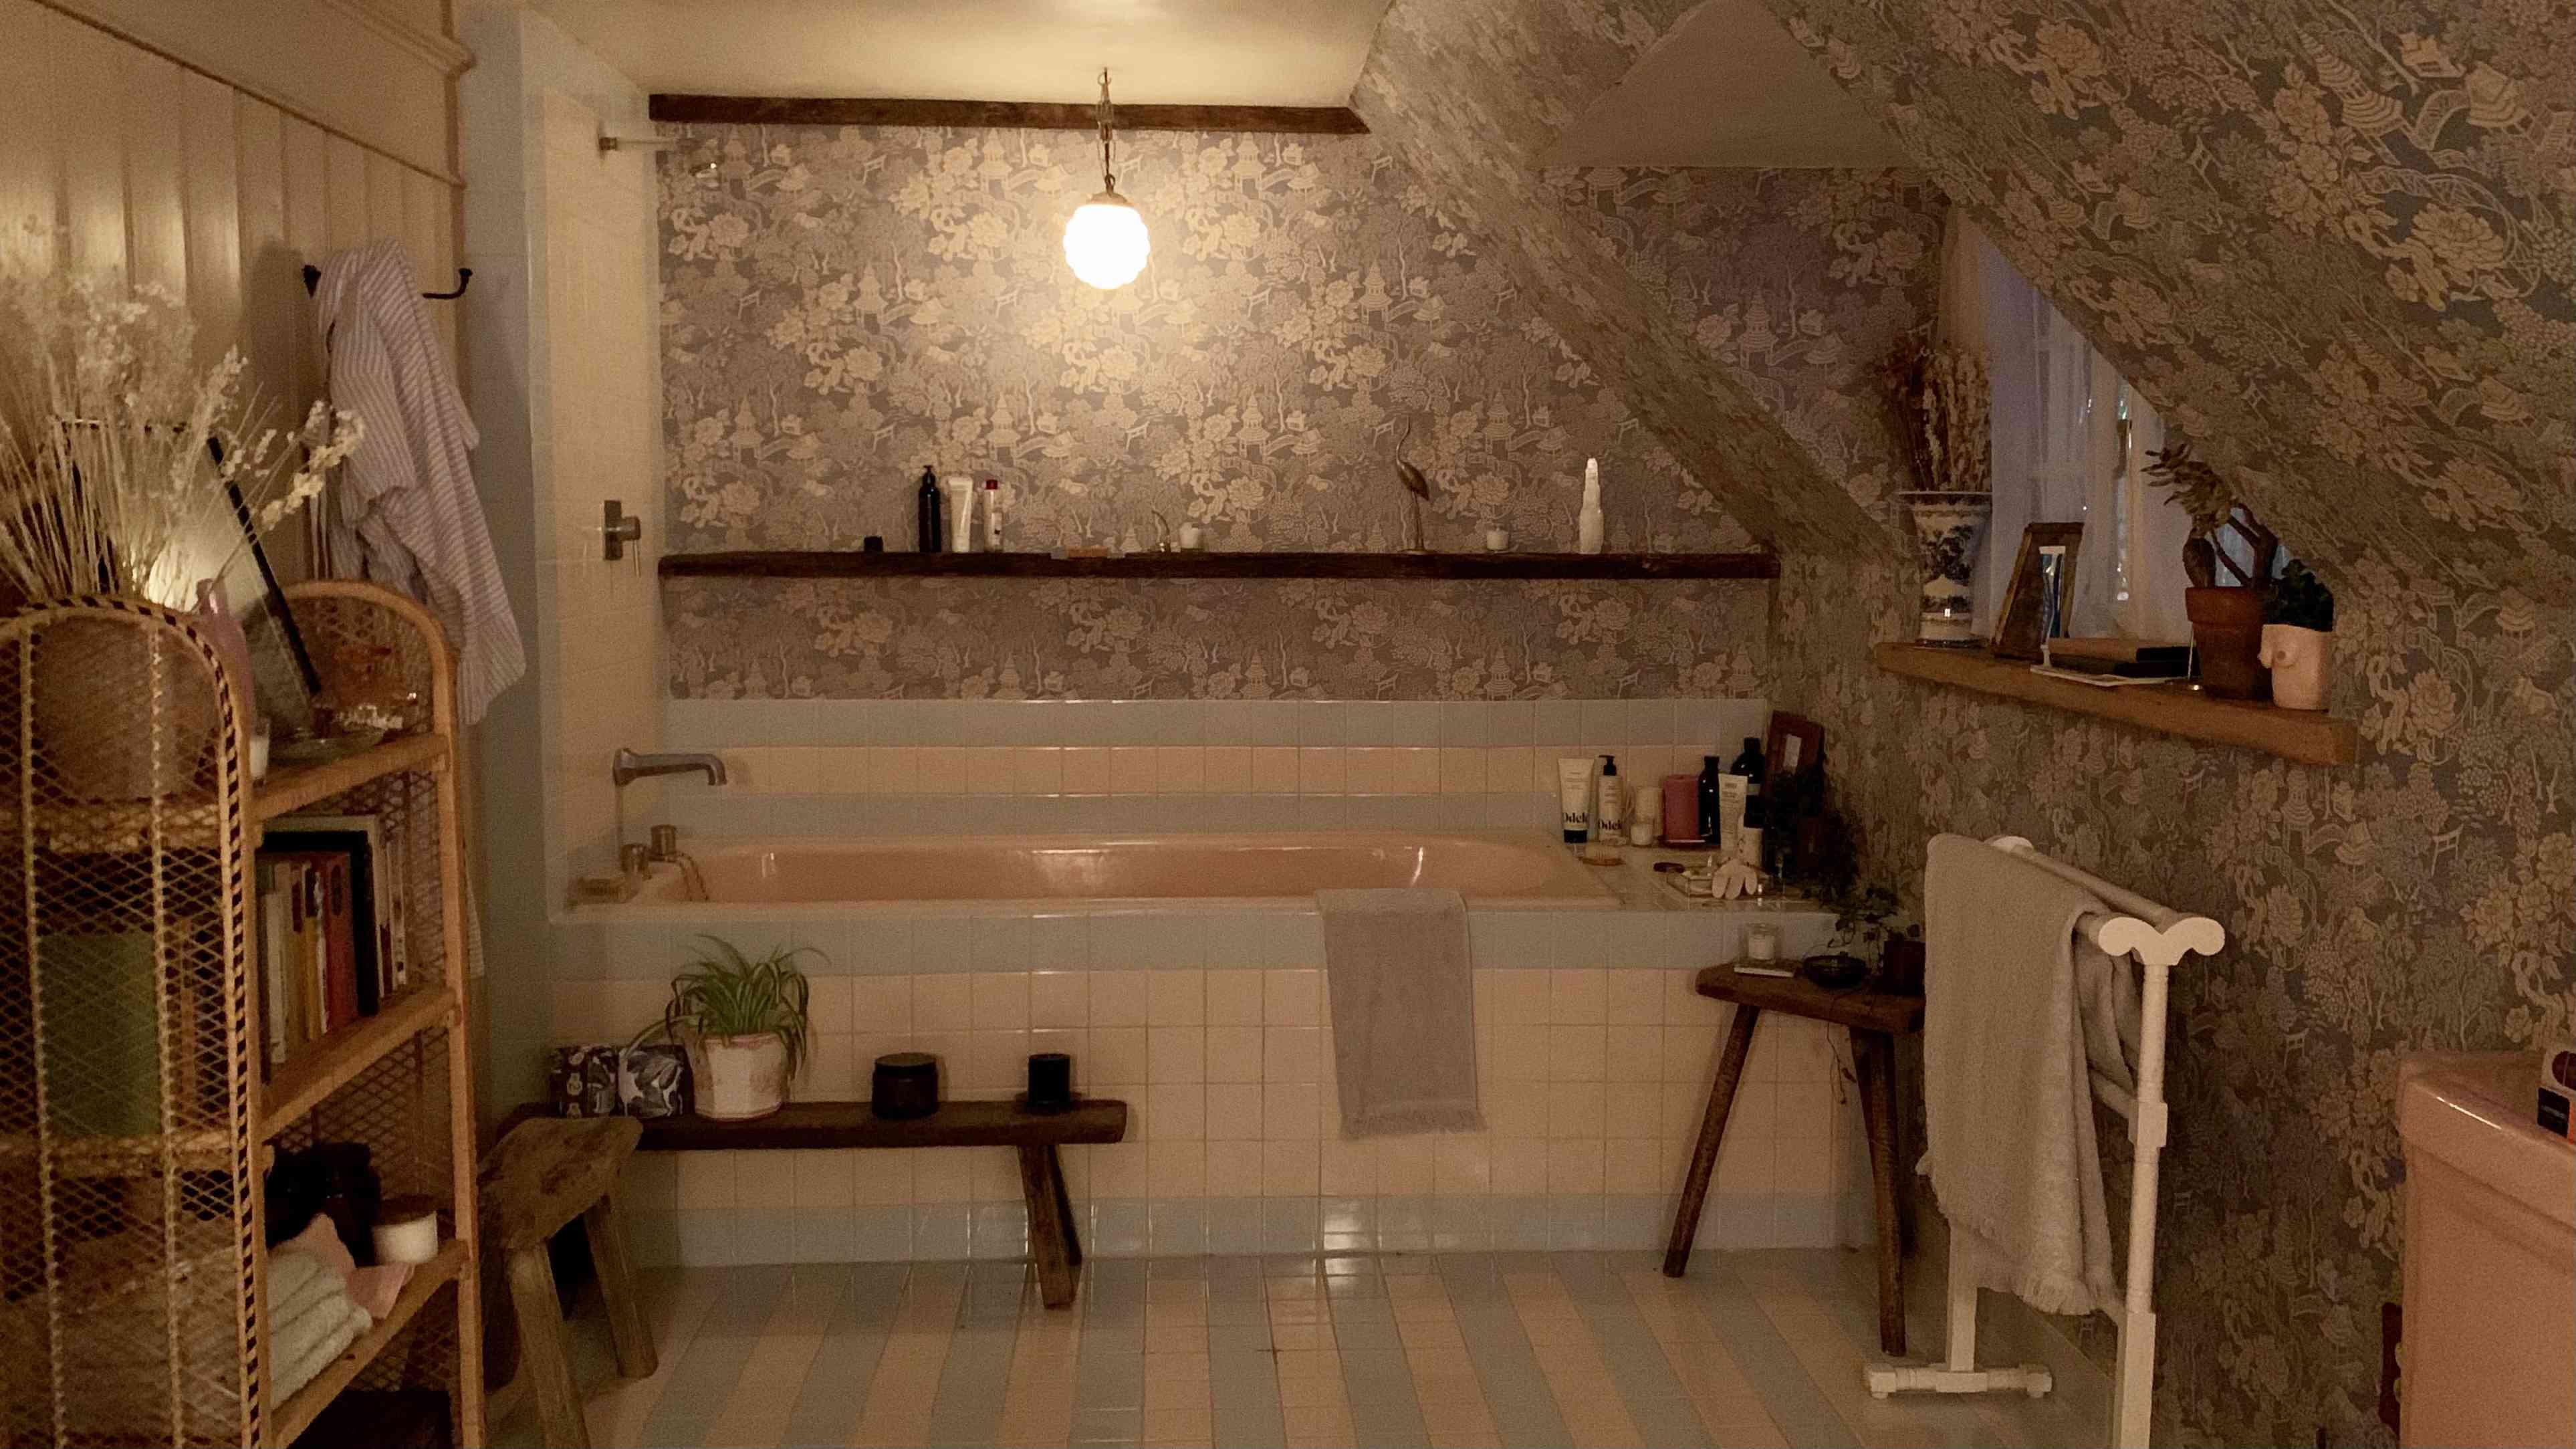 Bathroom on set of season 3 of Master of None